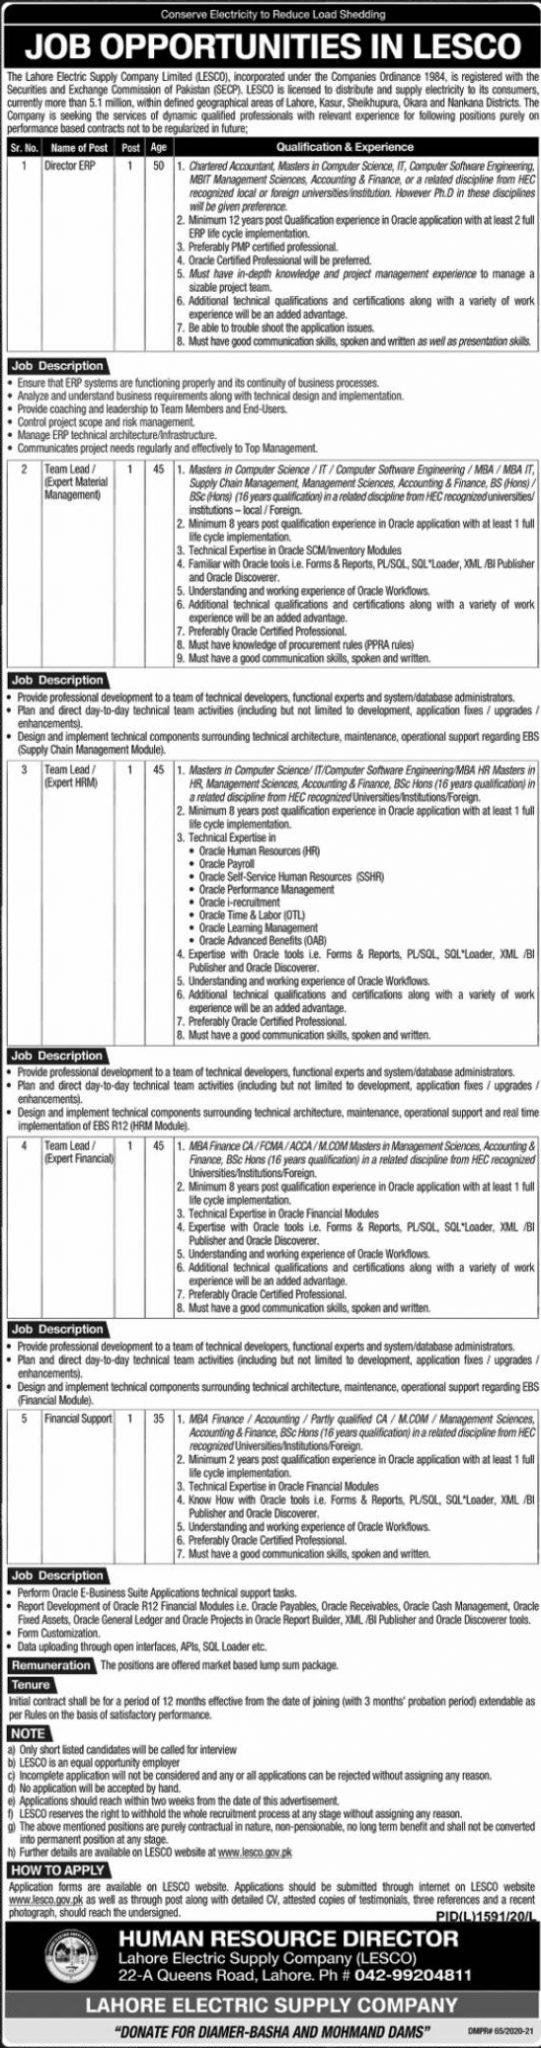 Lahore Electric Supply Company LESCO Jobs 2020 Application Form Eligibility Criteria